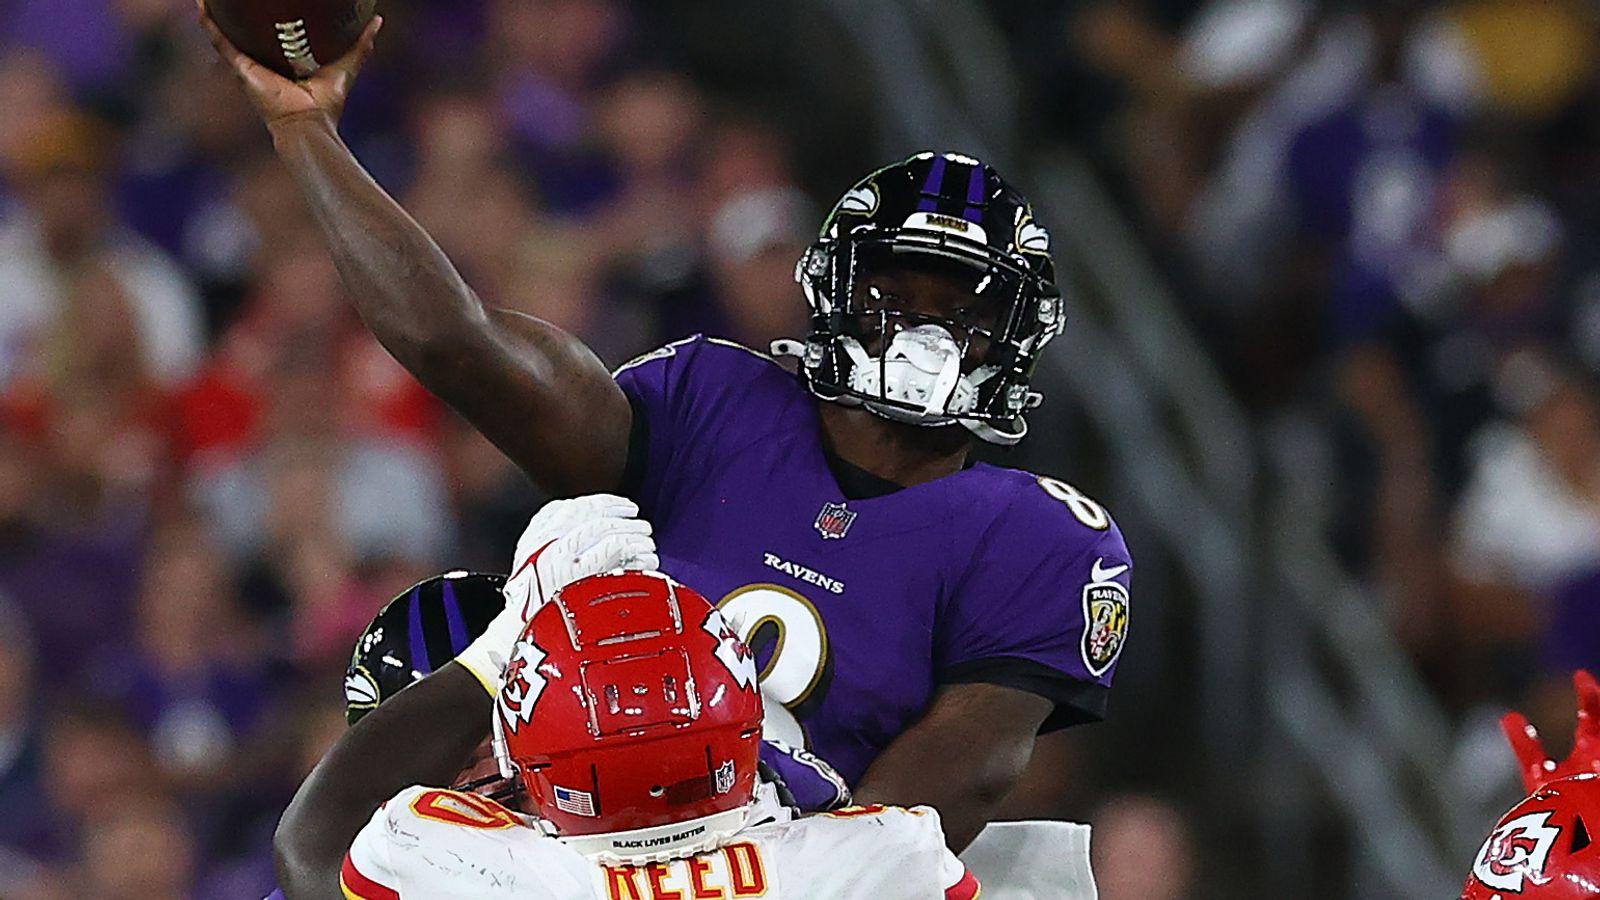 Kansas City Chiefs 35-36 Baltimore Ravens: Lamar Jackson leads Ravens to stunning comeback win